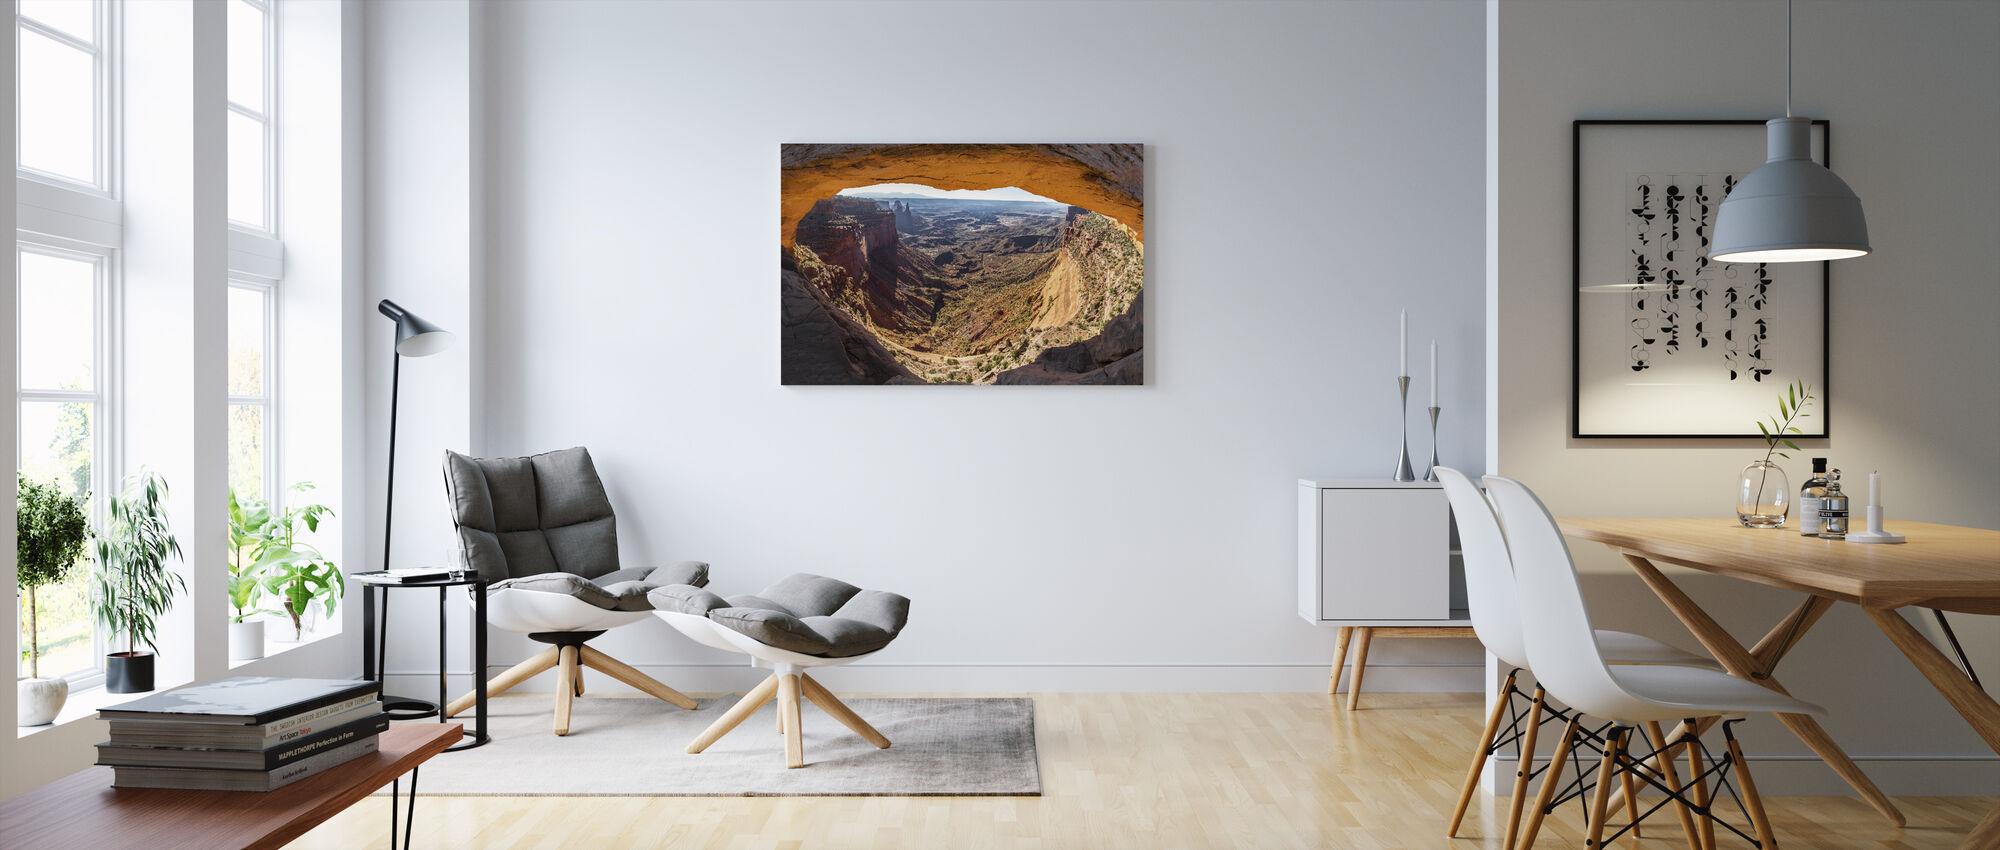 Mesa Arch - Canvastaulu - Olohuone